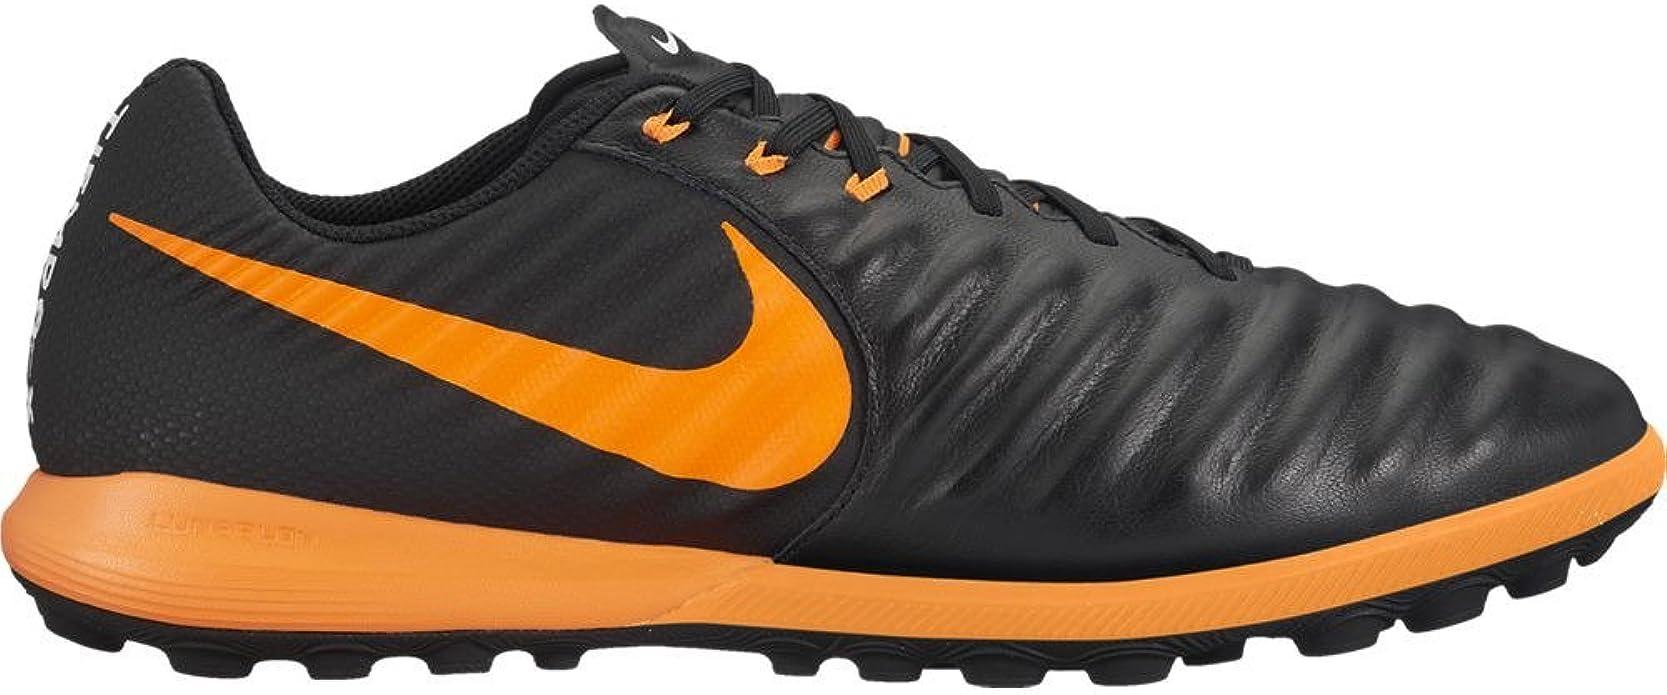 Compra Monumento hijo  Amazon.com | Nike Lunar LegendX 7 Pro Turf Shoes | Soccer